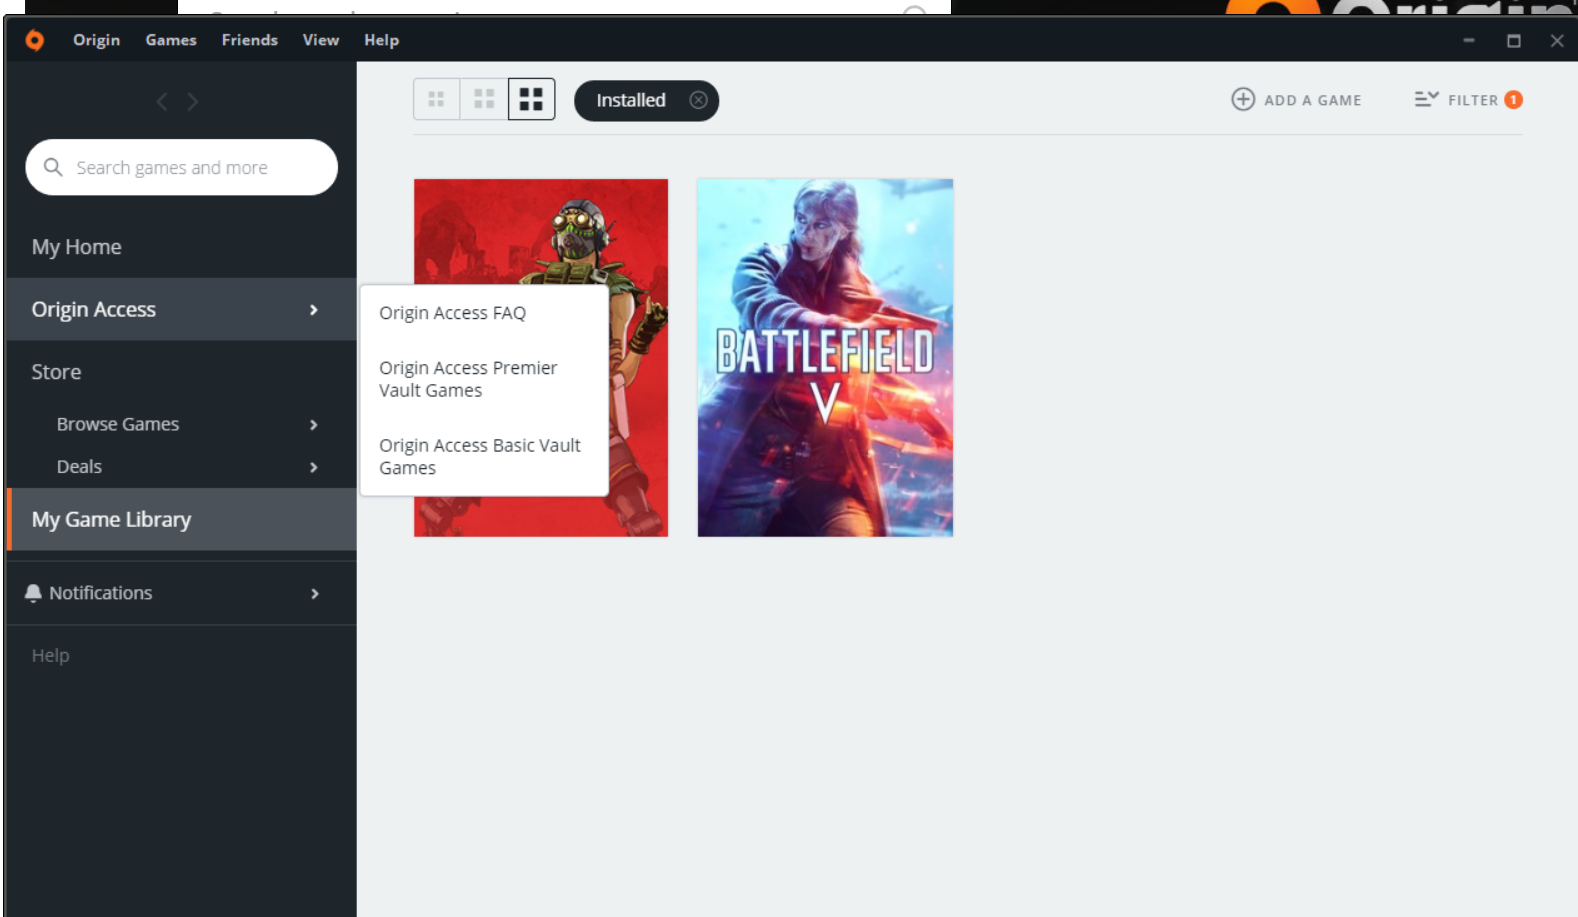 Origin app looks low quality/resolution - Answer HQ